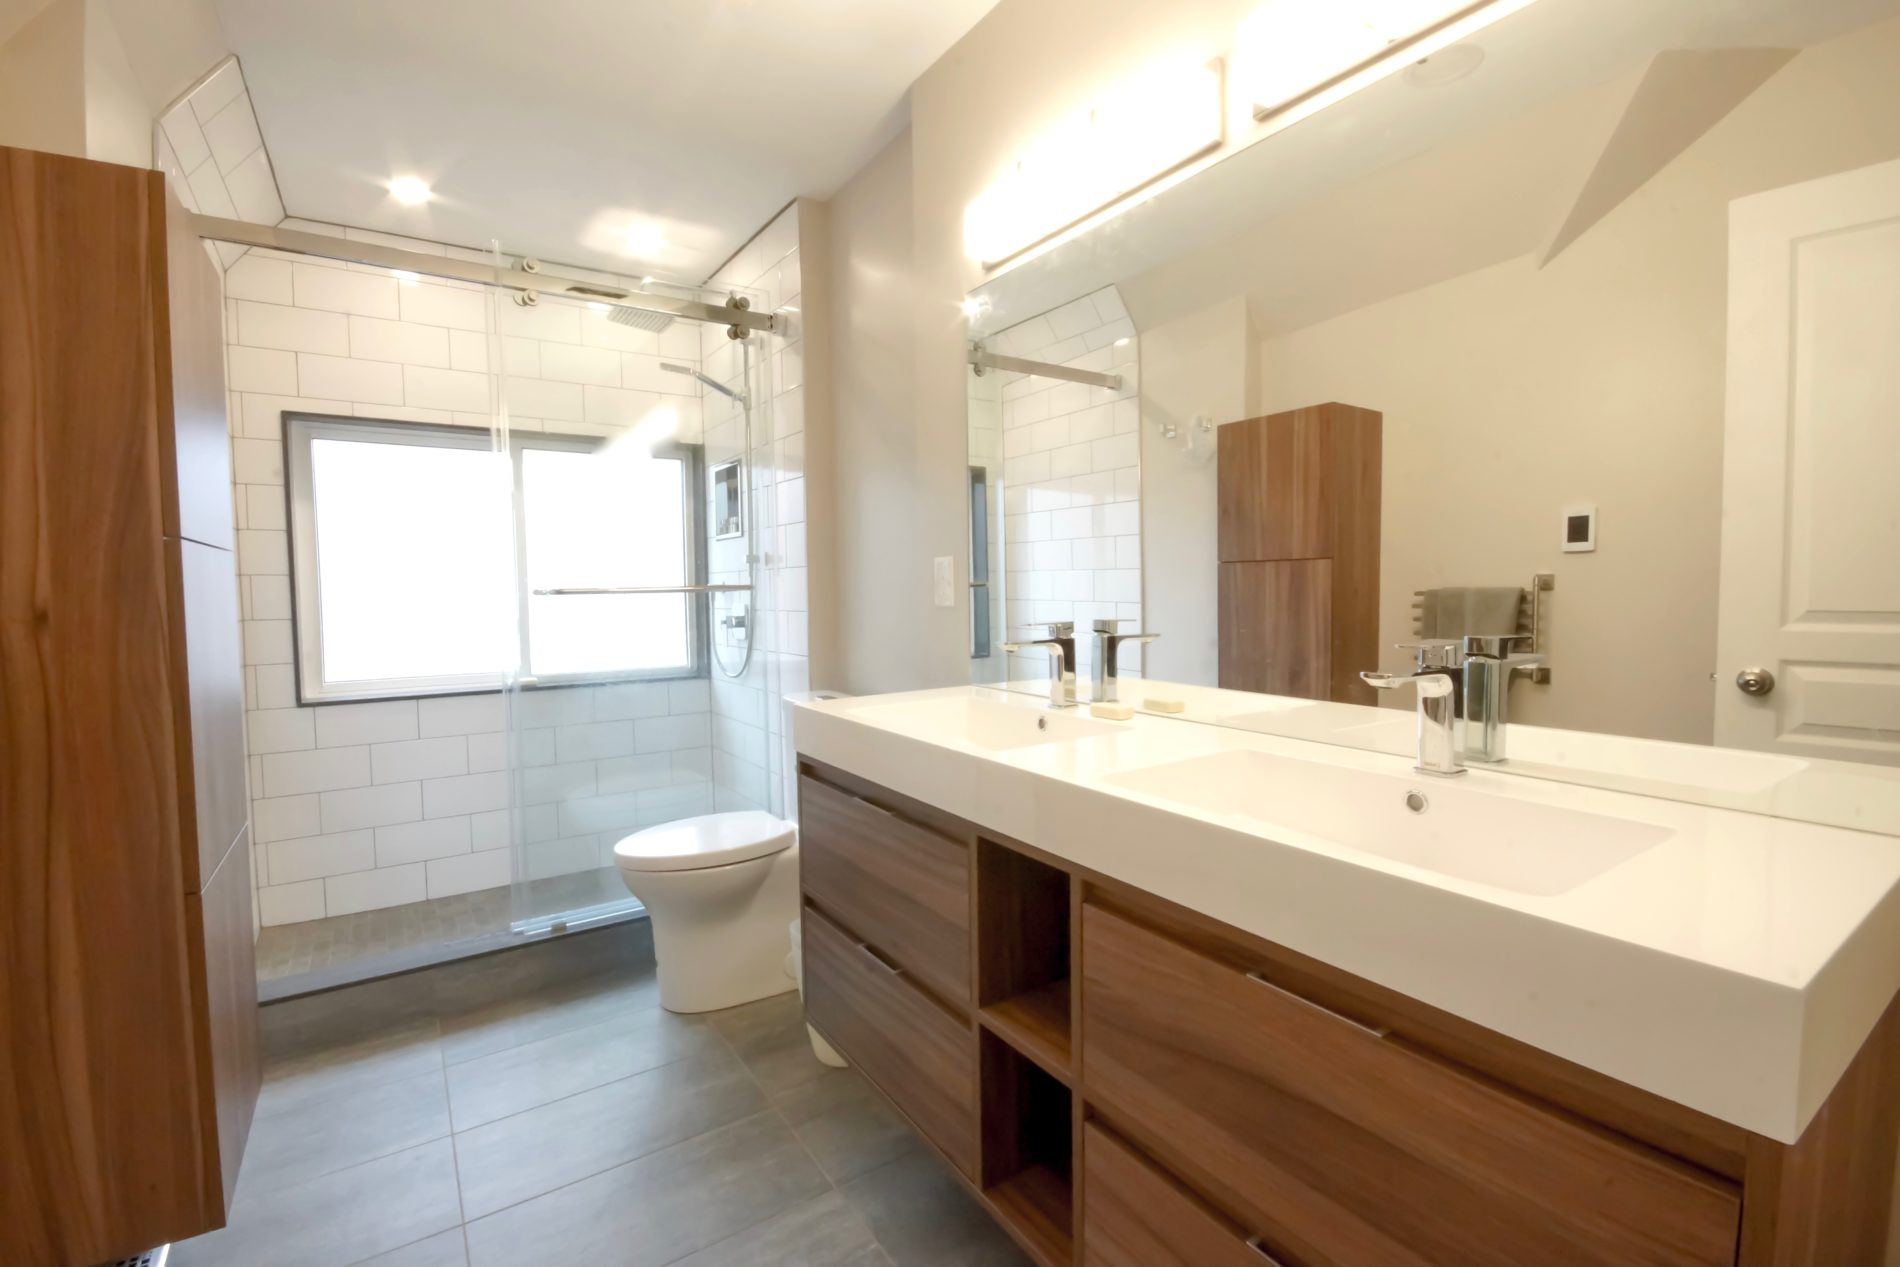 East York Ave. – Toronto Contemporary Bathroom - Featured Image